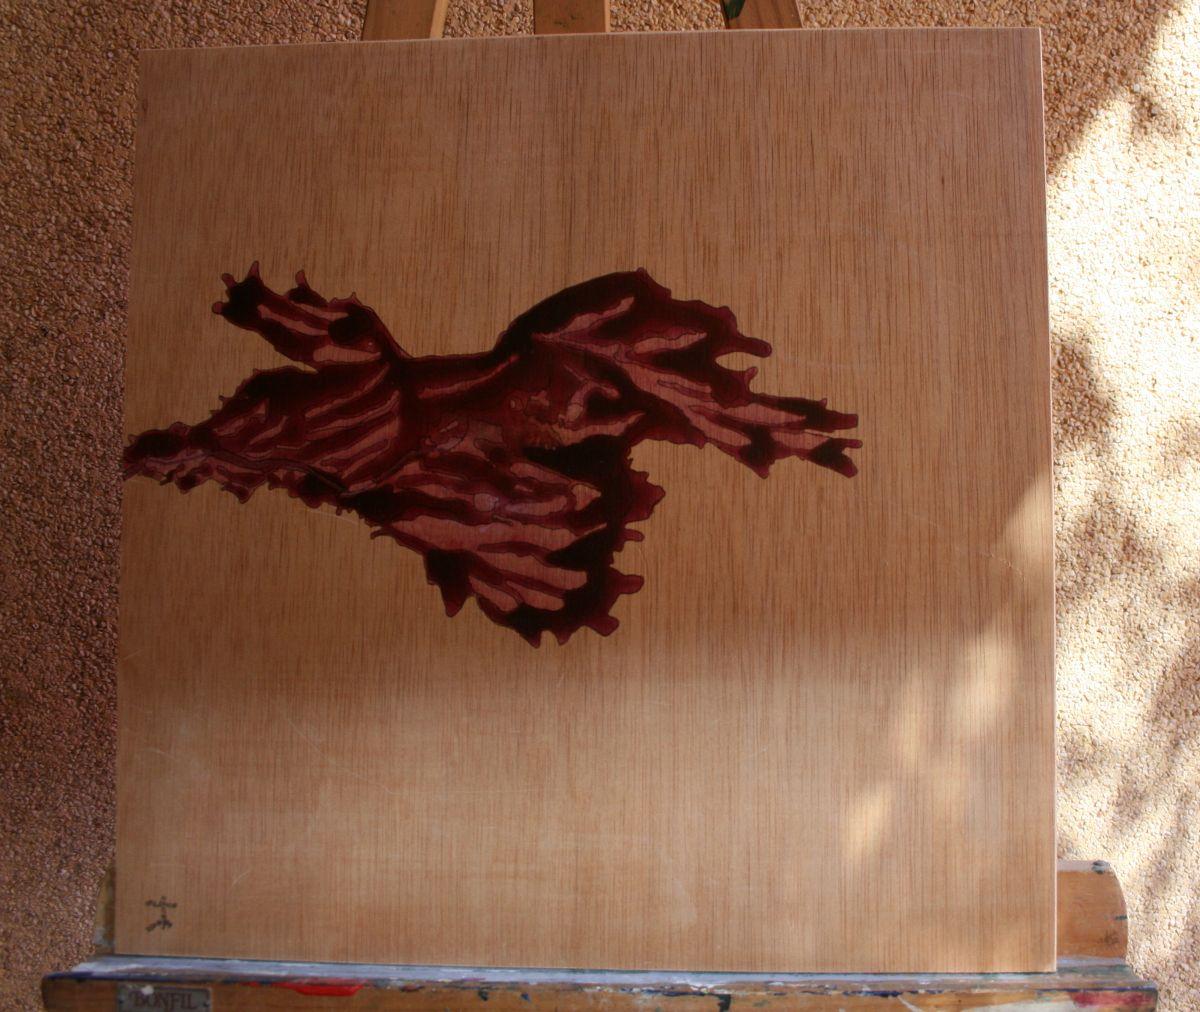 #arte #abstracto #mixta #pintura #acrilica #cinta #madera #tabla #morado 41x41cm #2015